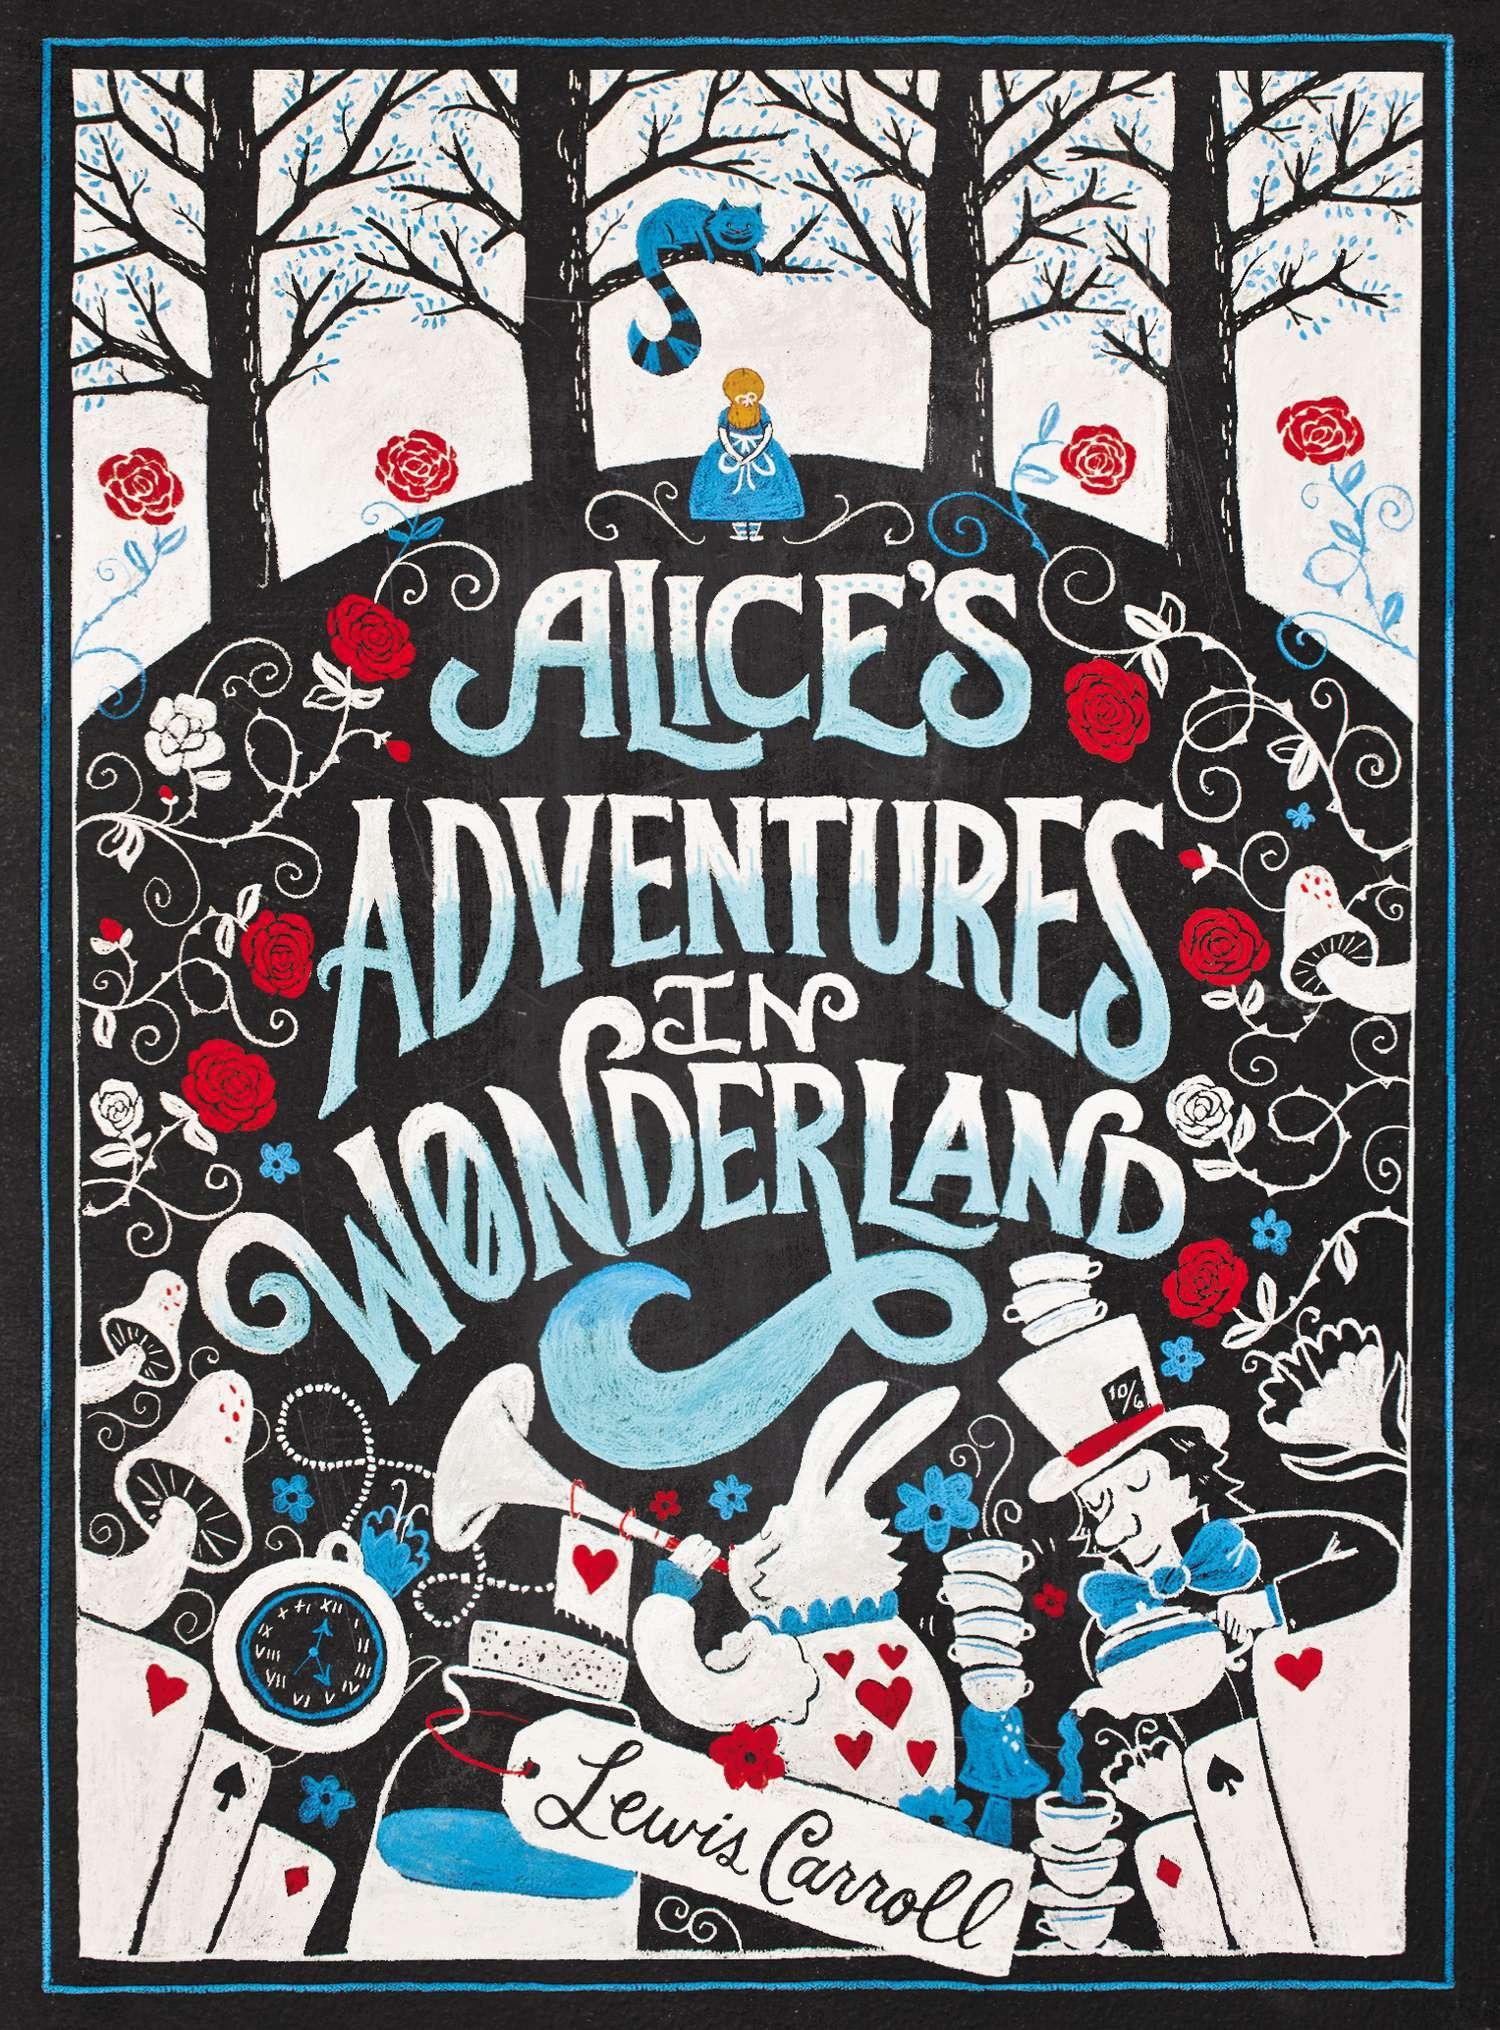 Creative Book Cover Uk ~ Alice s adventures in wonderland puffin chalk series